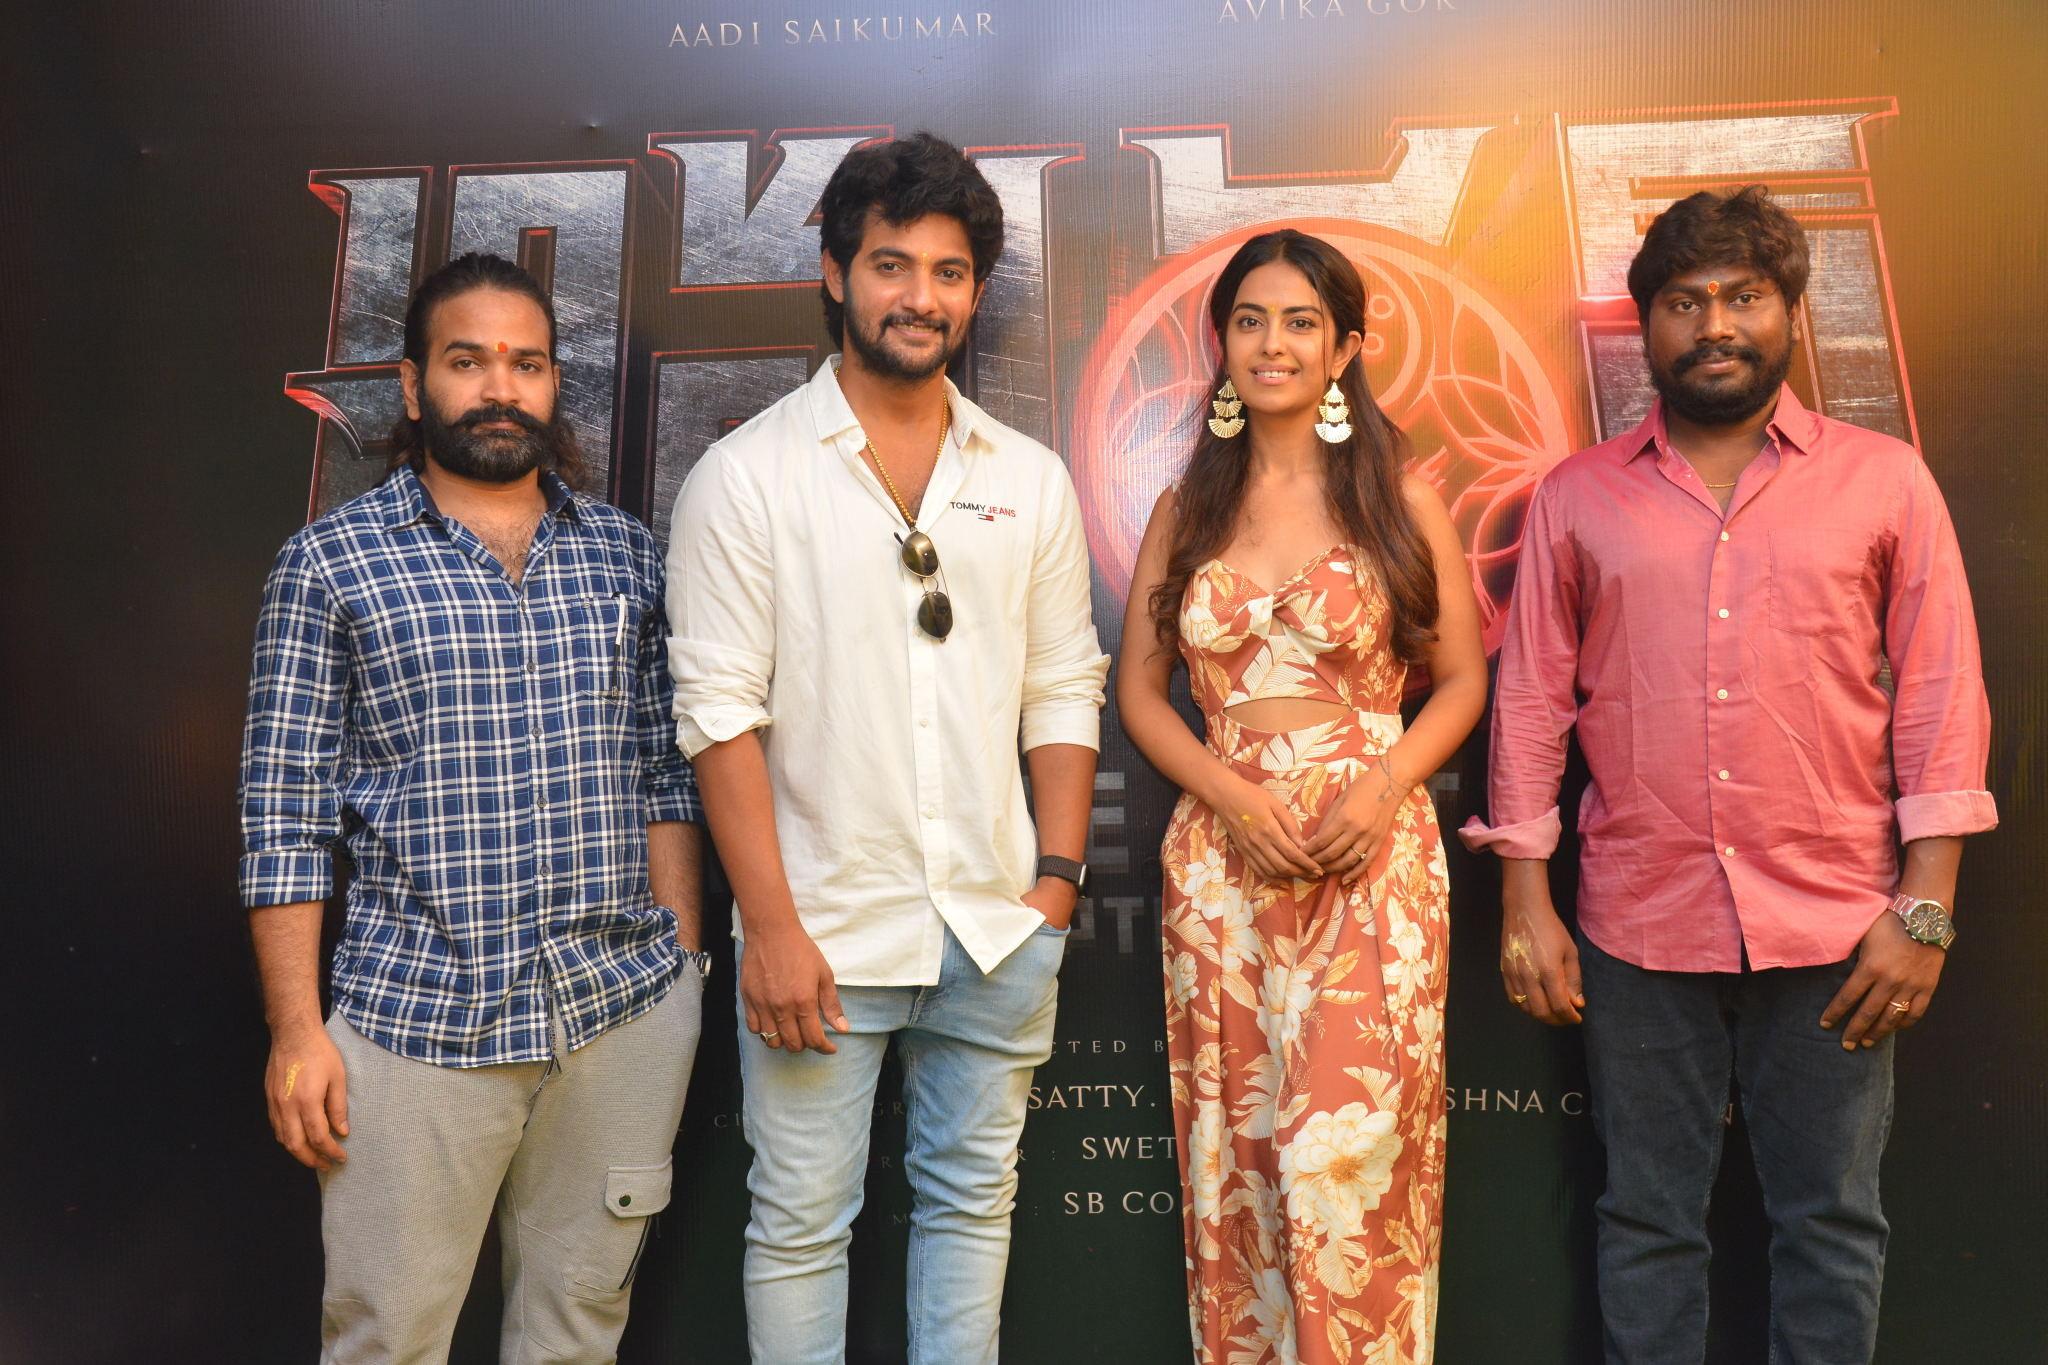 Aadi Saikumar Avika Gor @ Amaran In The City - Chapter 1 Movie Launch Stills